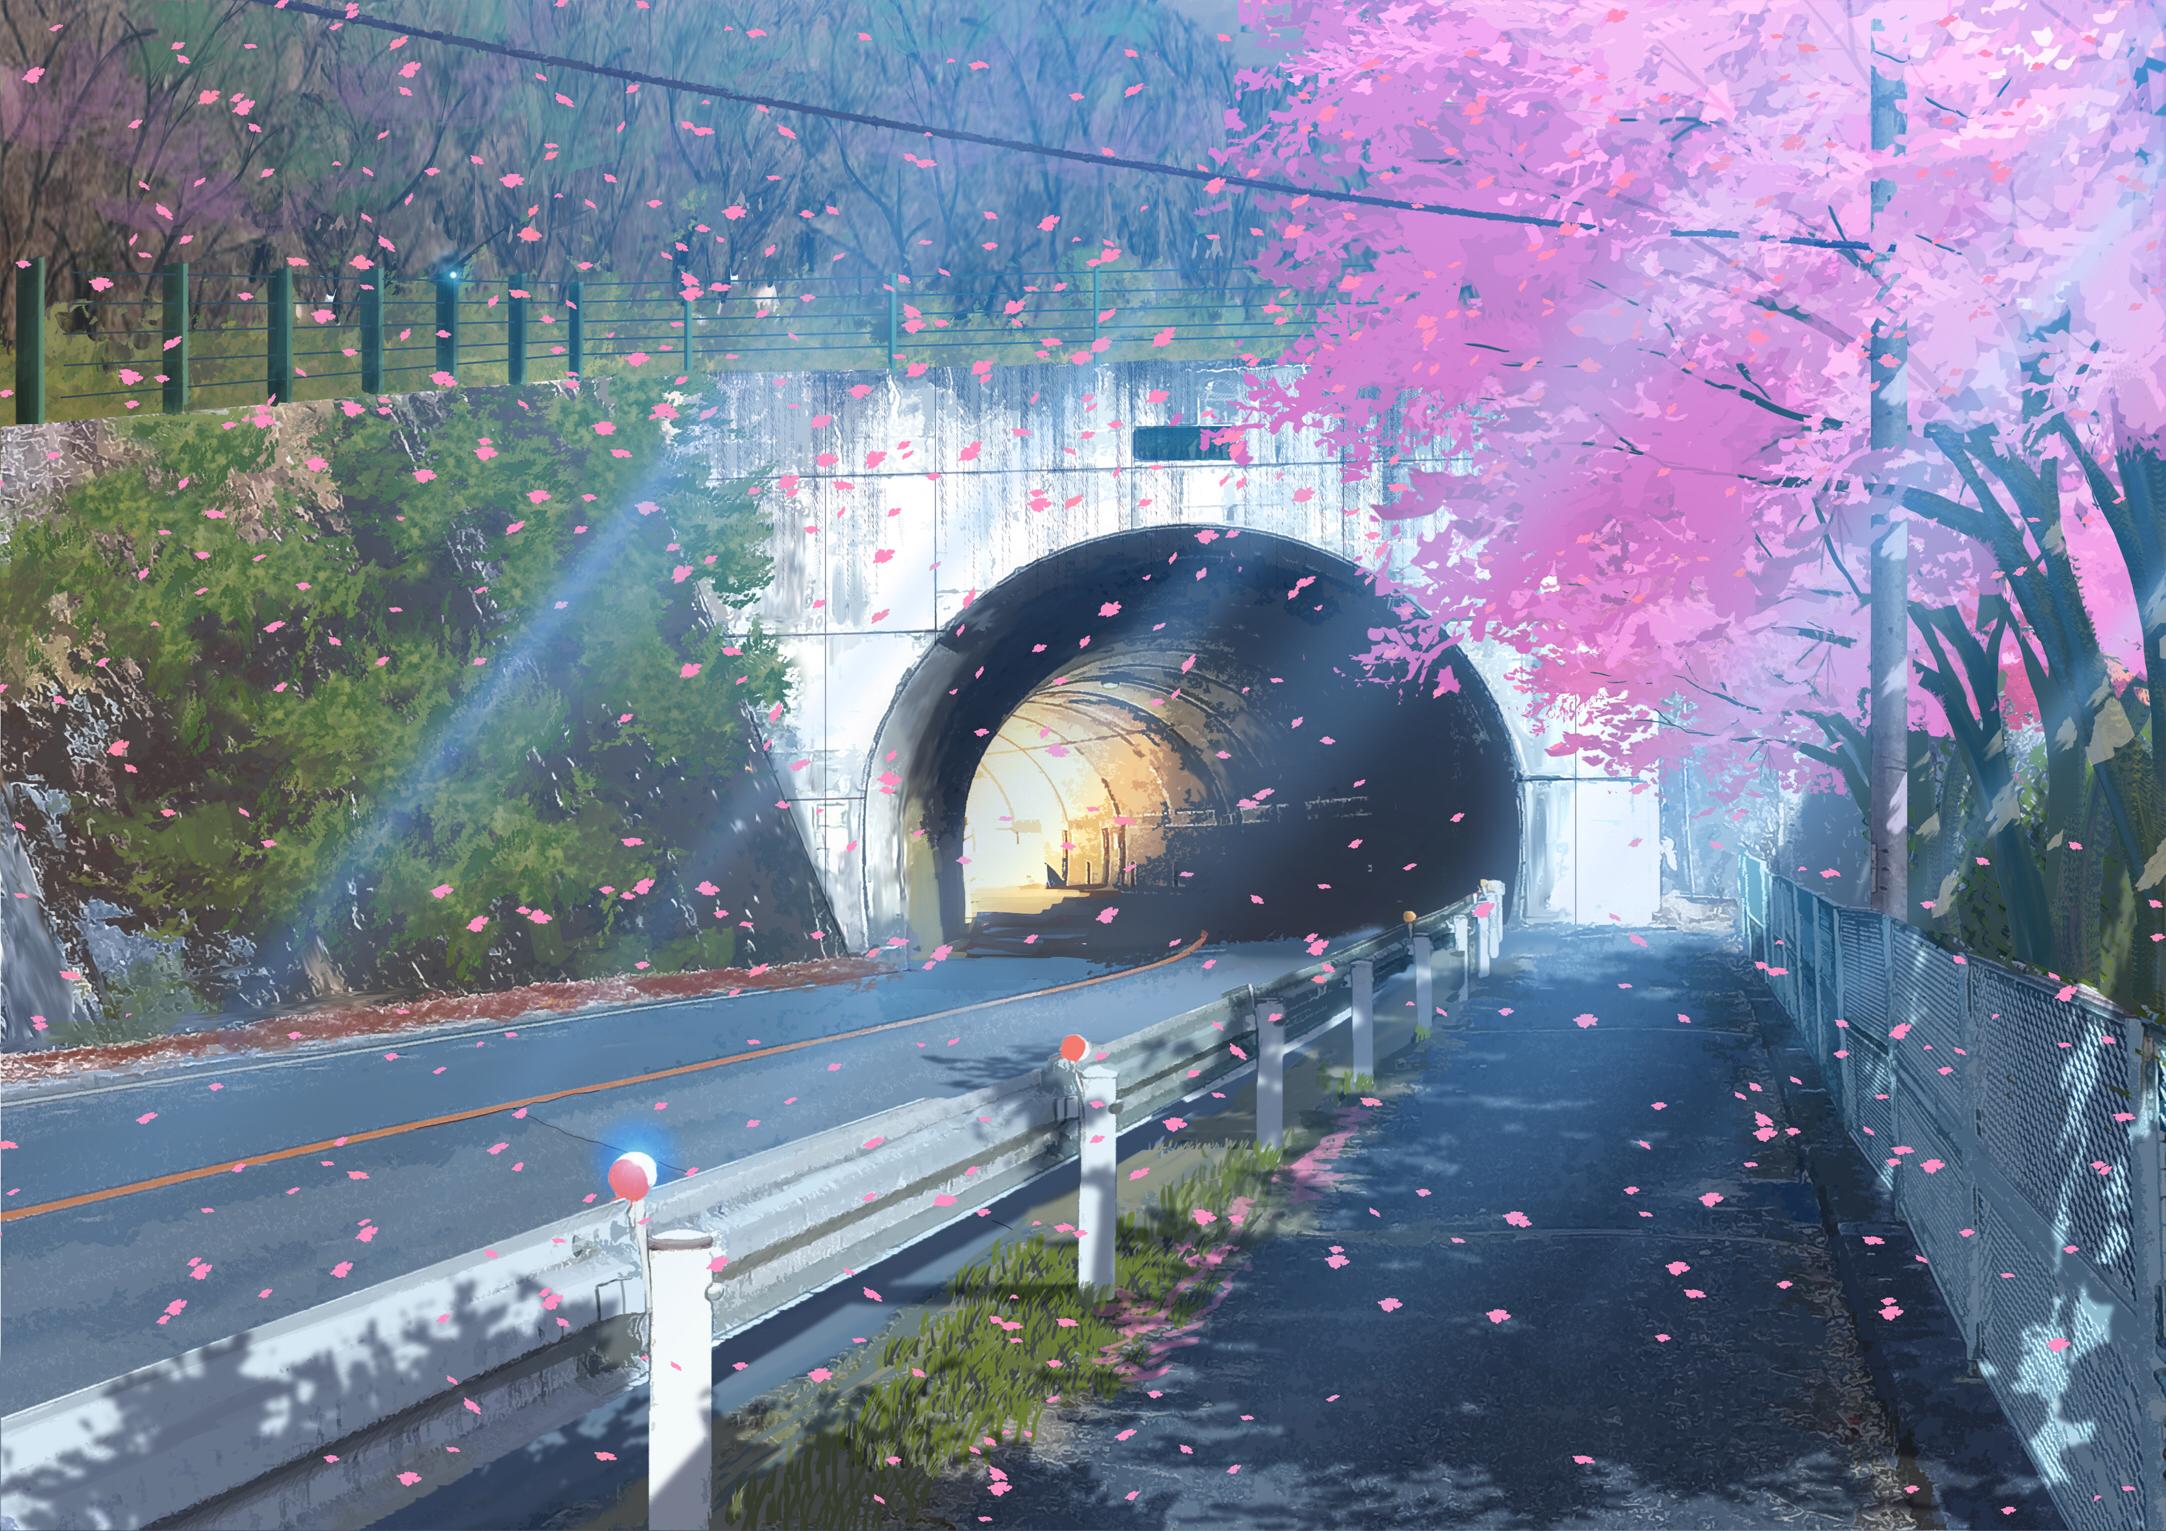 【P站画师】日本画师スマッシャーT_T的插画作品- ACG17.COM